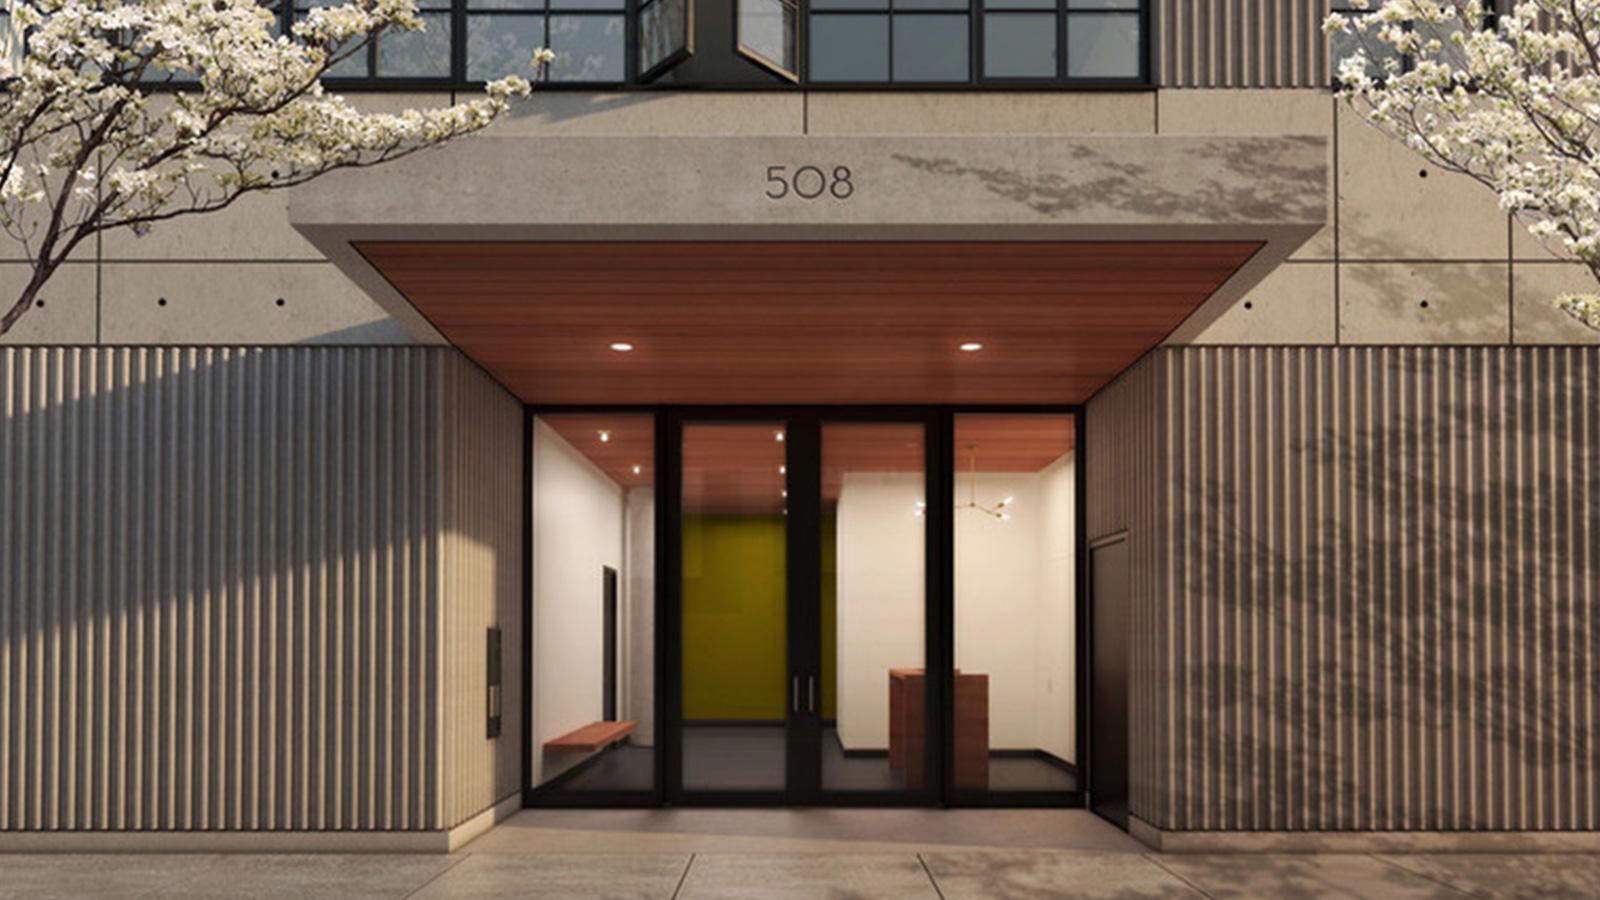 508 West 24th Street